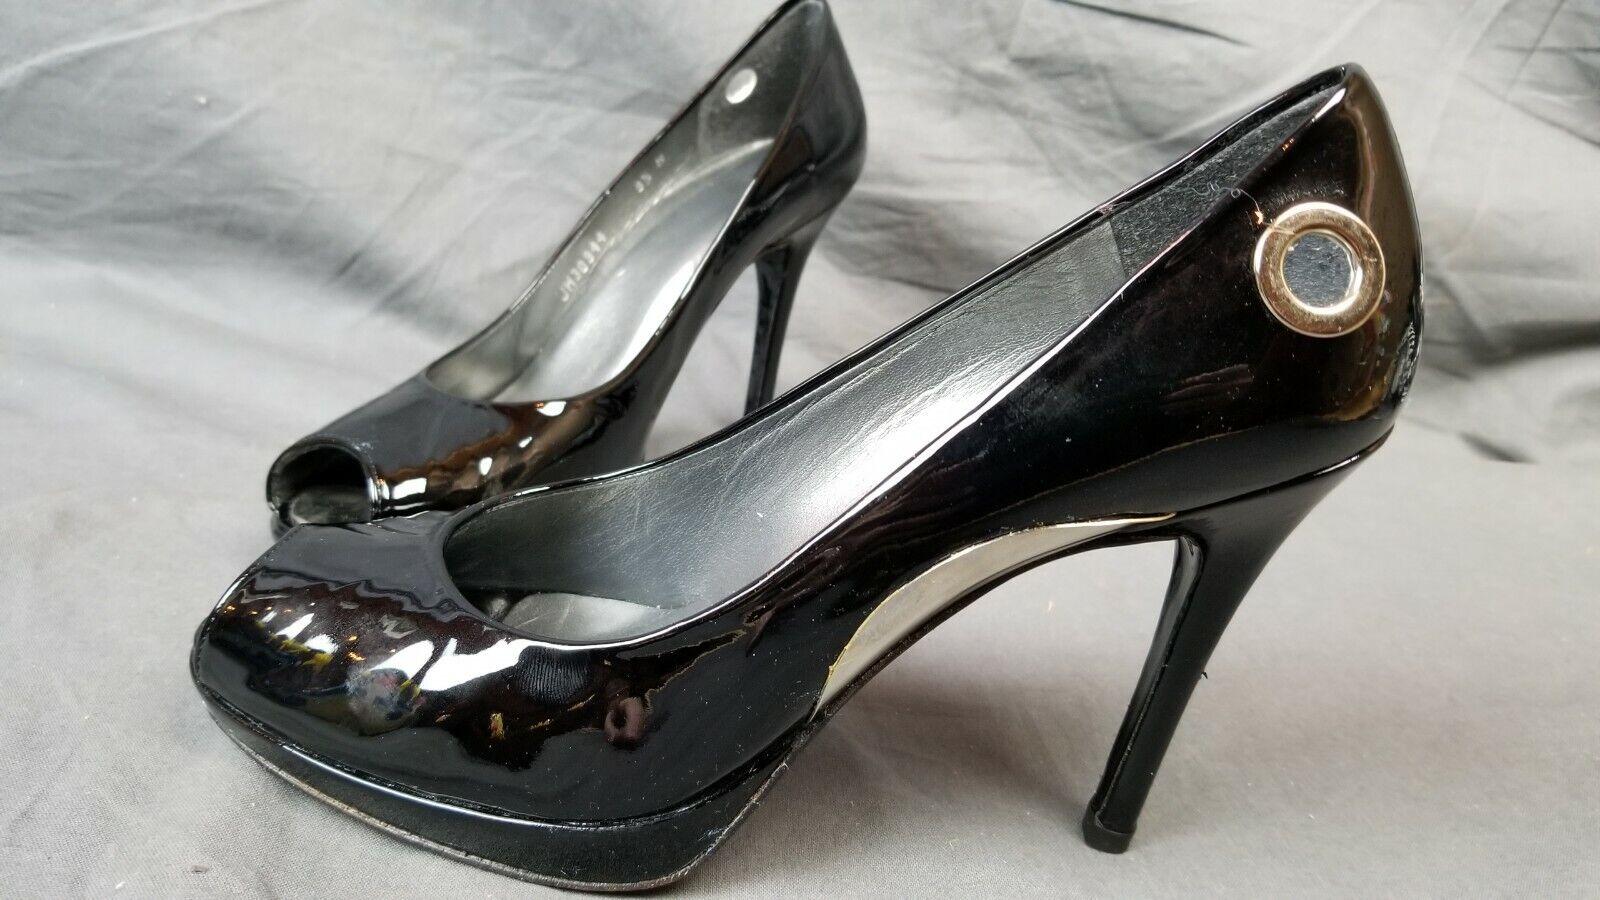 e32f873fb12 Stuart Weitzman Black Patent Leather Peep Toe Pumps Heels 4.25 ...